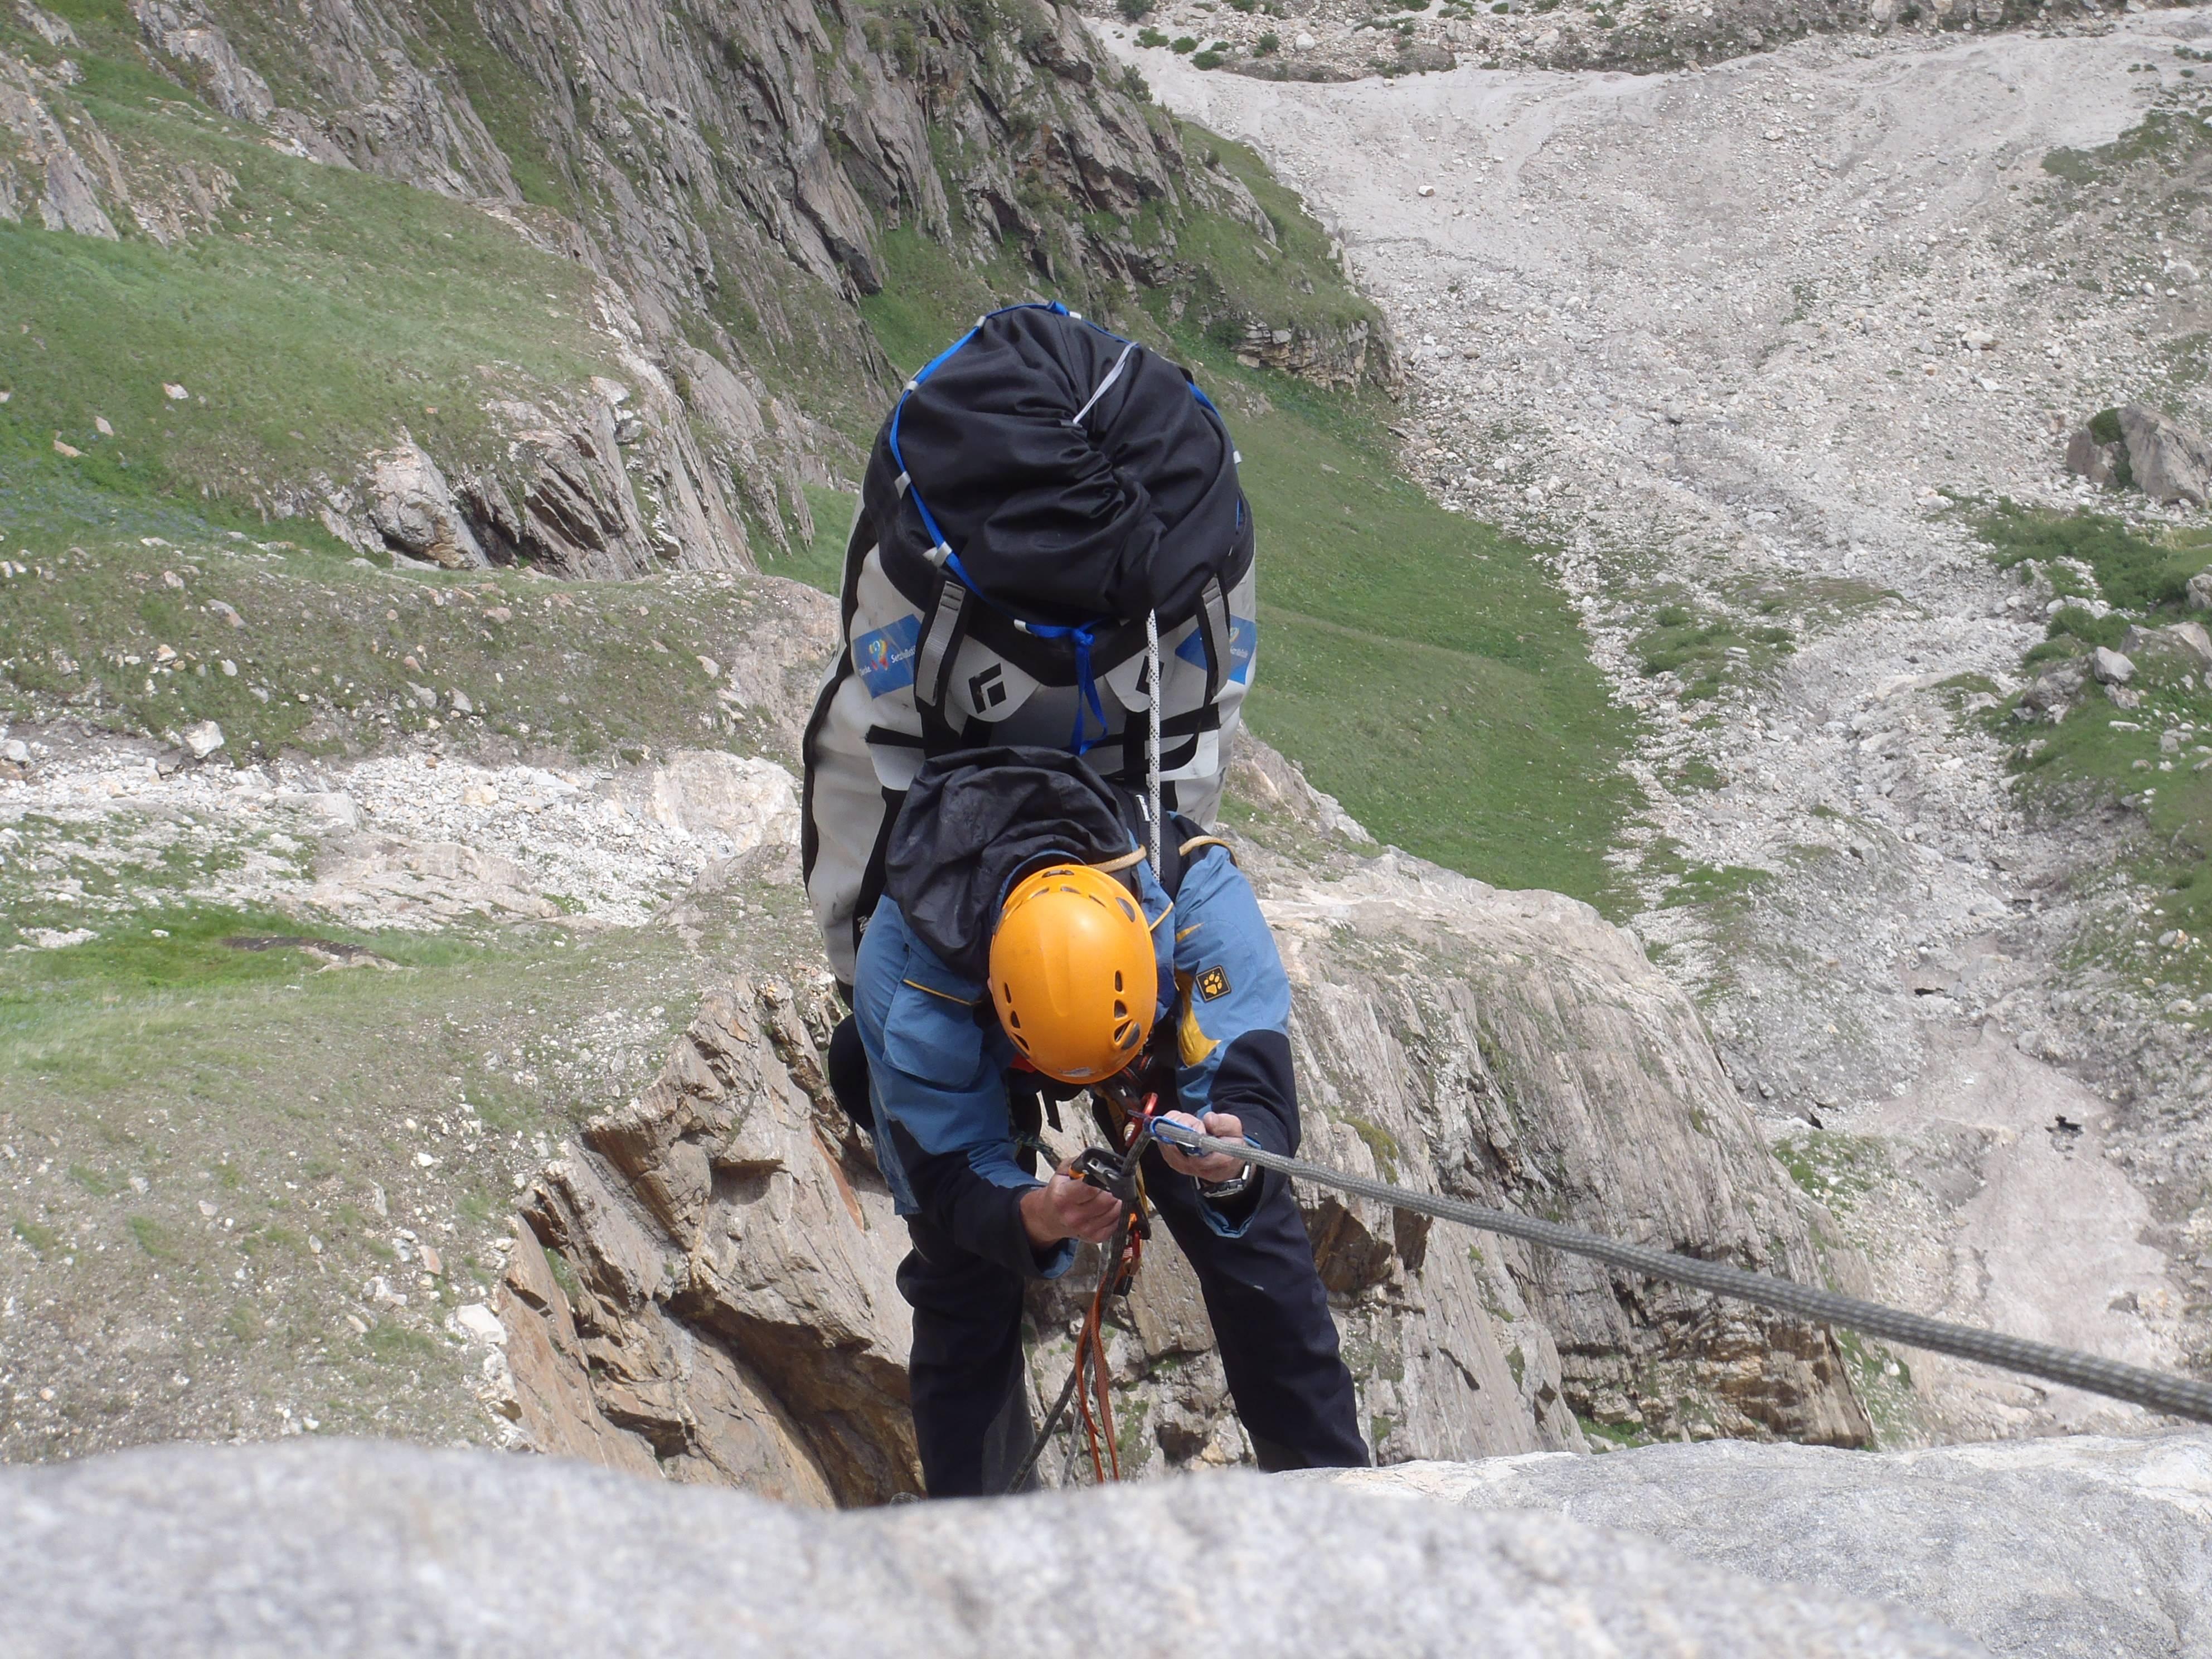 Kletterausrüstung Handgepäck : Bigwallklettern im karakorum